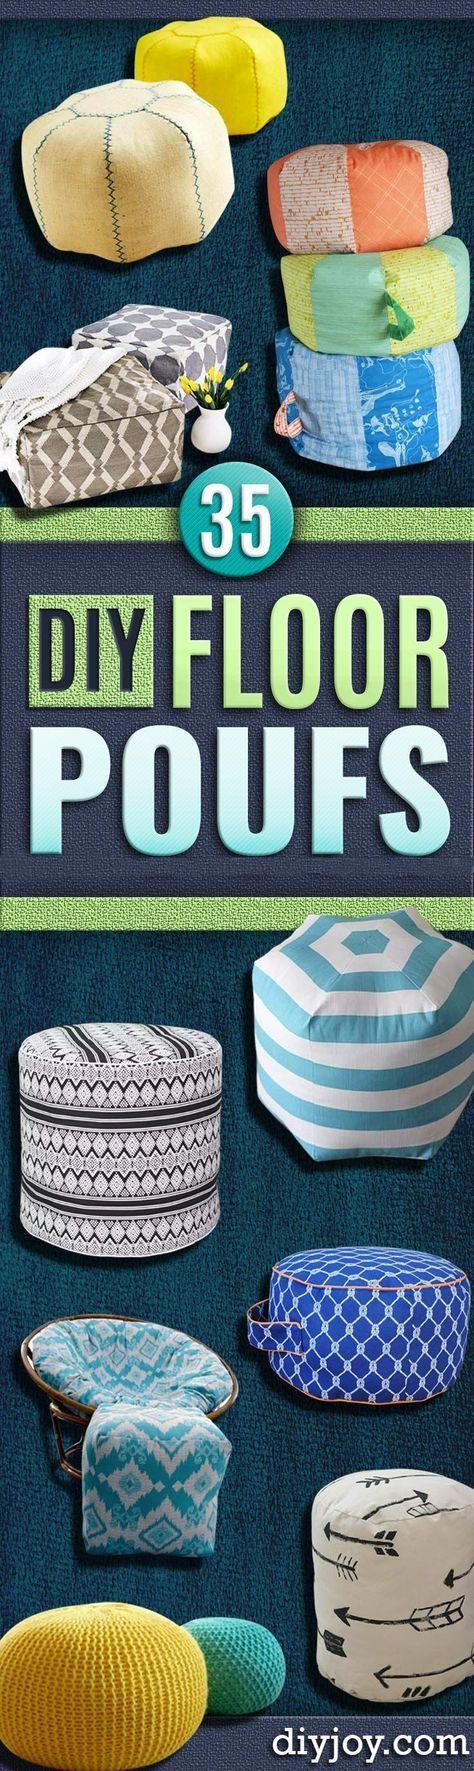 17 Best ideas about Diy Pouf on Pinterest Floor pouf, Chrochet and Crochet pouf